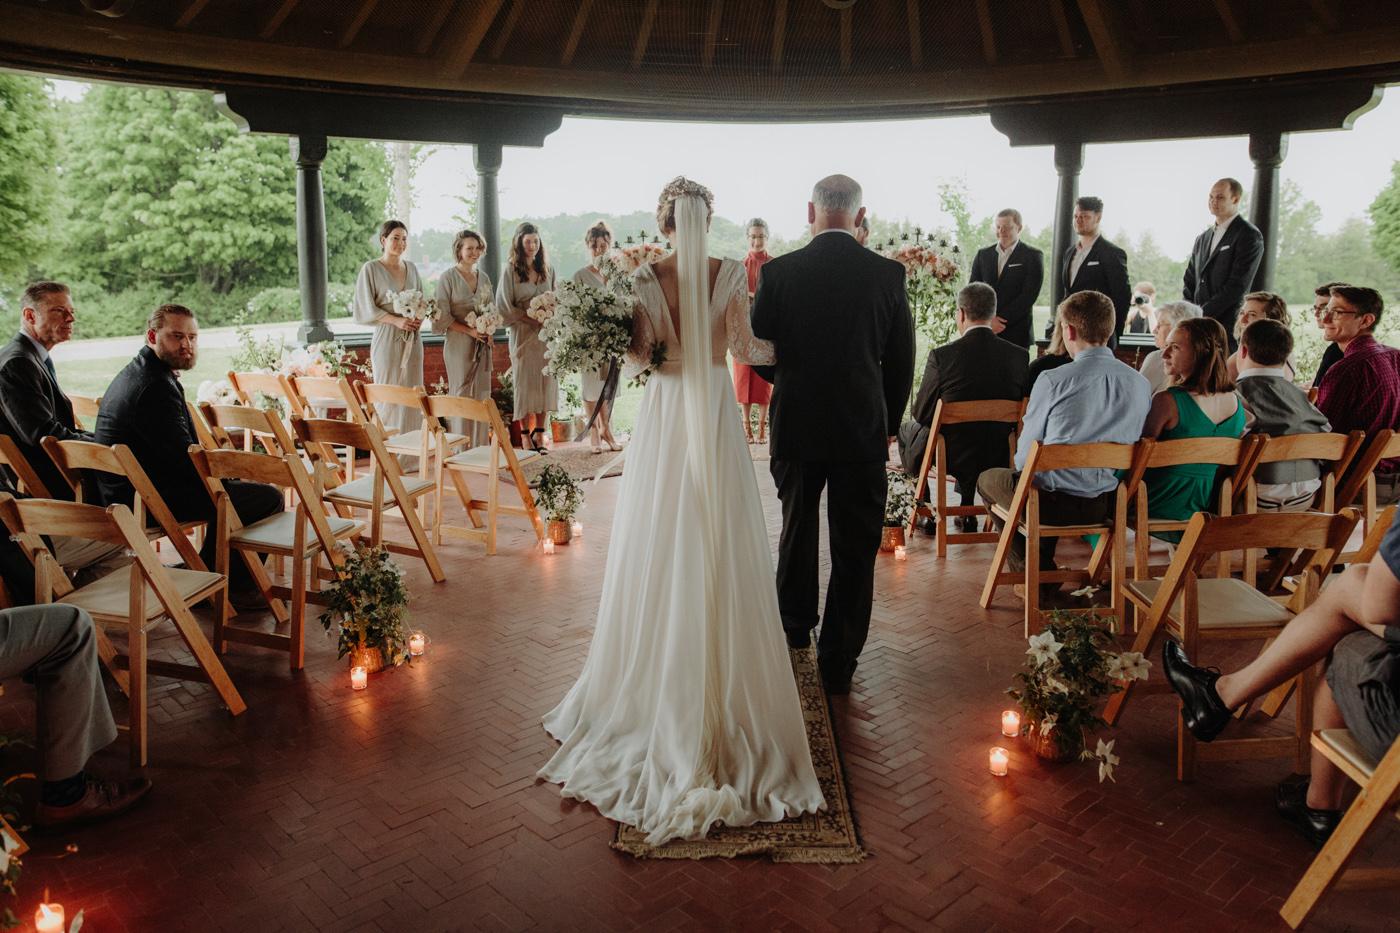 Erin-Mike-Intimate-Vintage-Wedding-Shelburne-Farms-Vermont -80.jpg